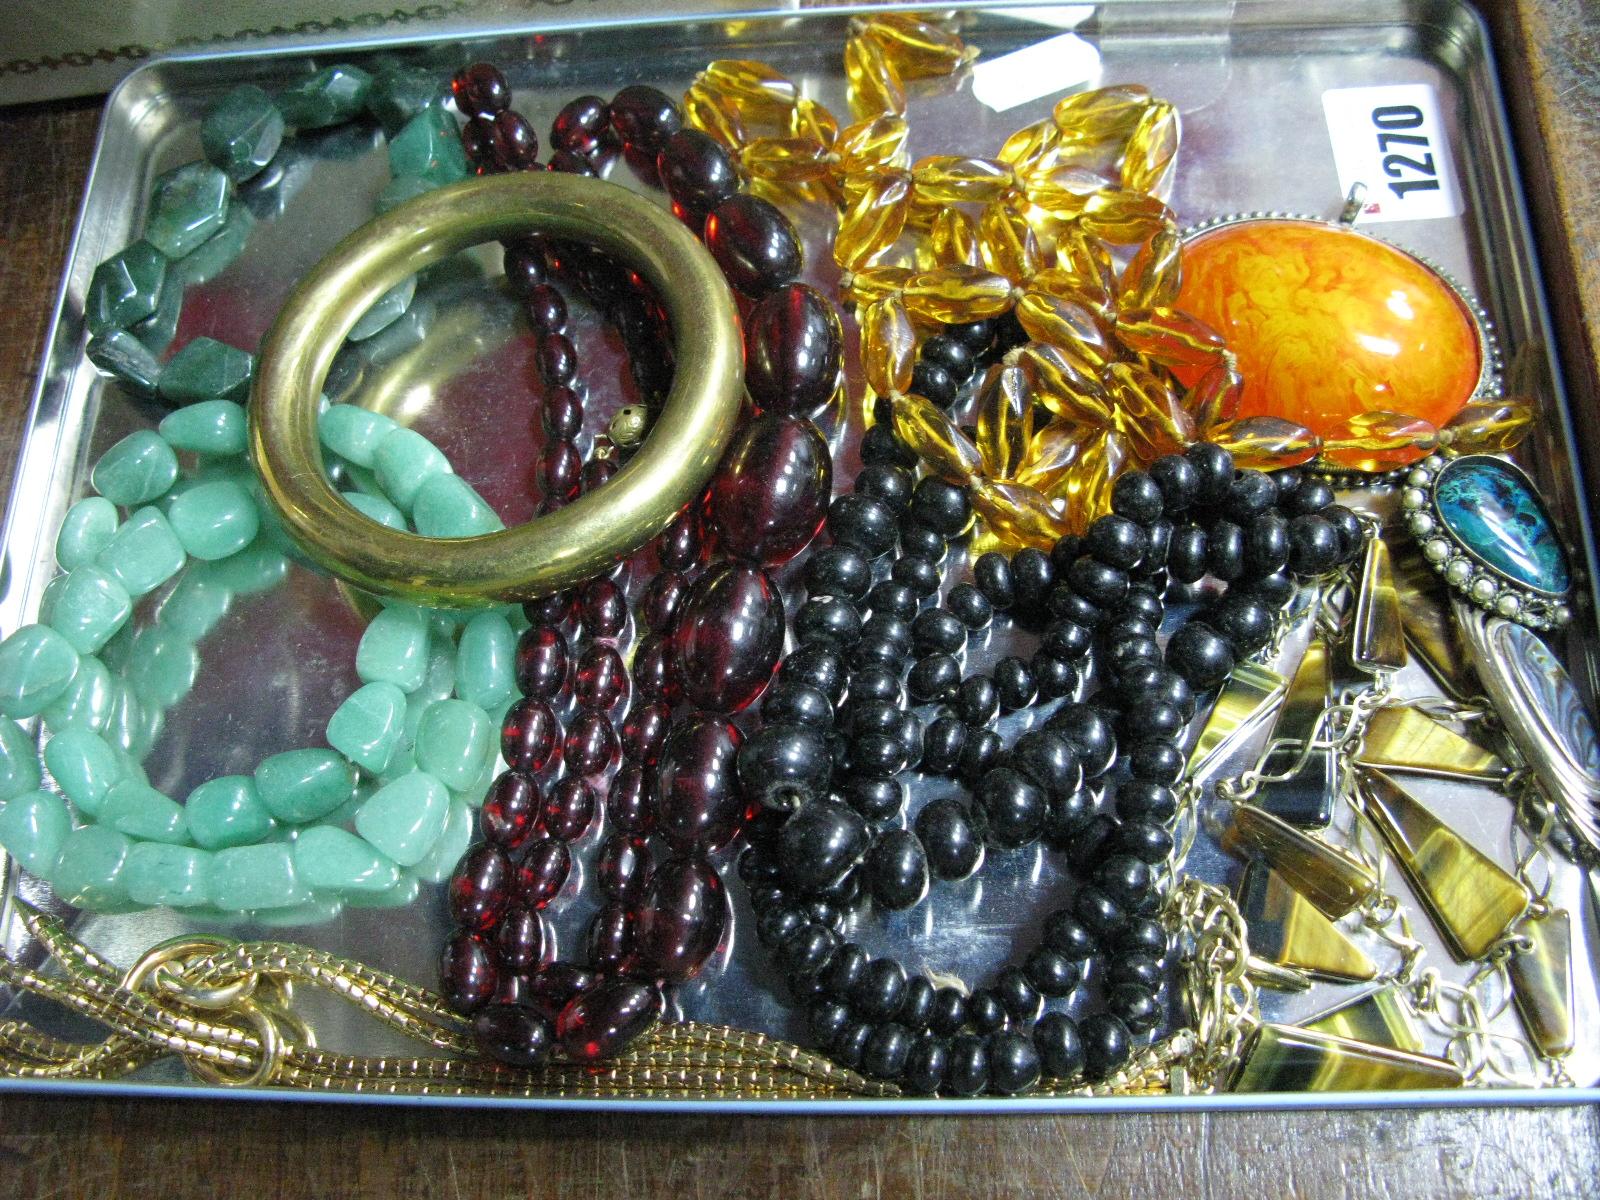 Lot 1270 - Grosse 1958 German Vintage Costume Necklace, bead necklaces, bangle, etc.